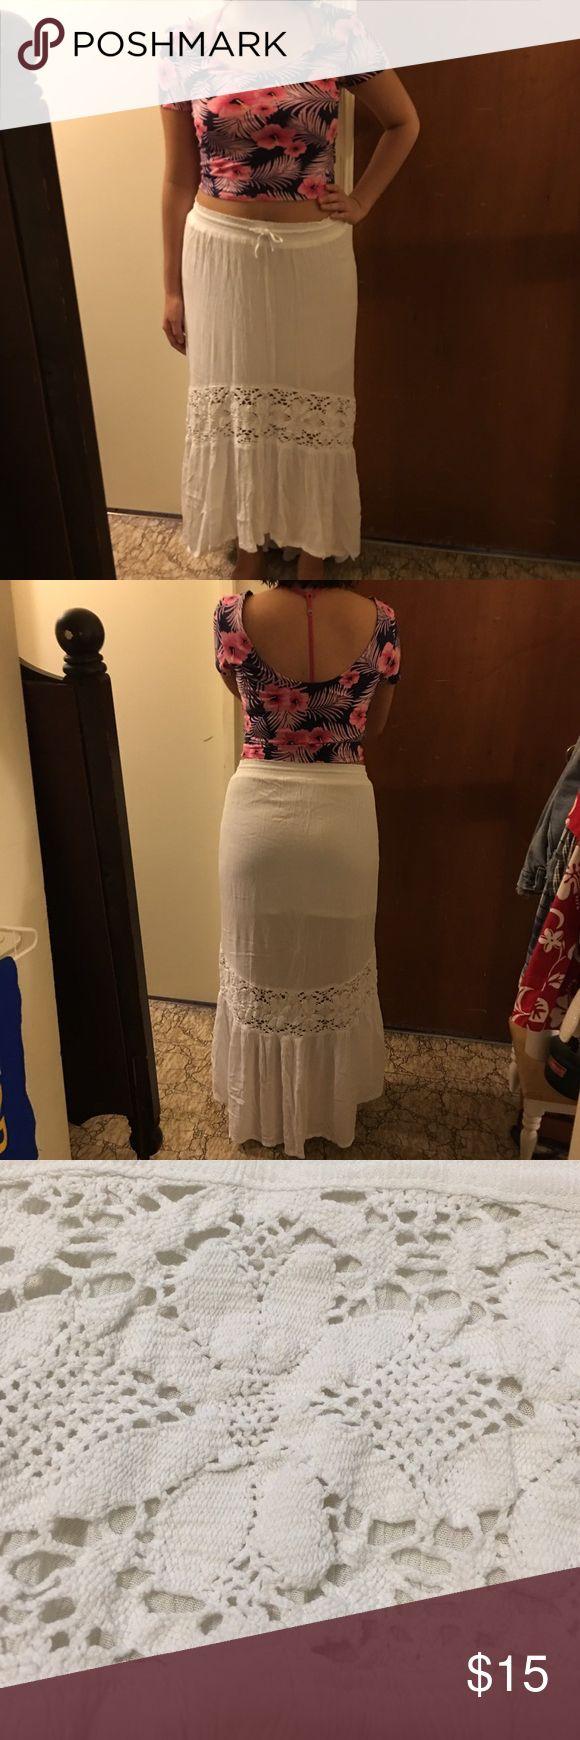 Selling this JUST IN🎉 Aeropostale Maxi Skirt on Poshmark! My username is: pandacita. #shopmycloset #poshmark #fashion #shopping #style #forsale #Aeropostale #Dresses & Skirts